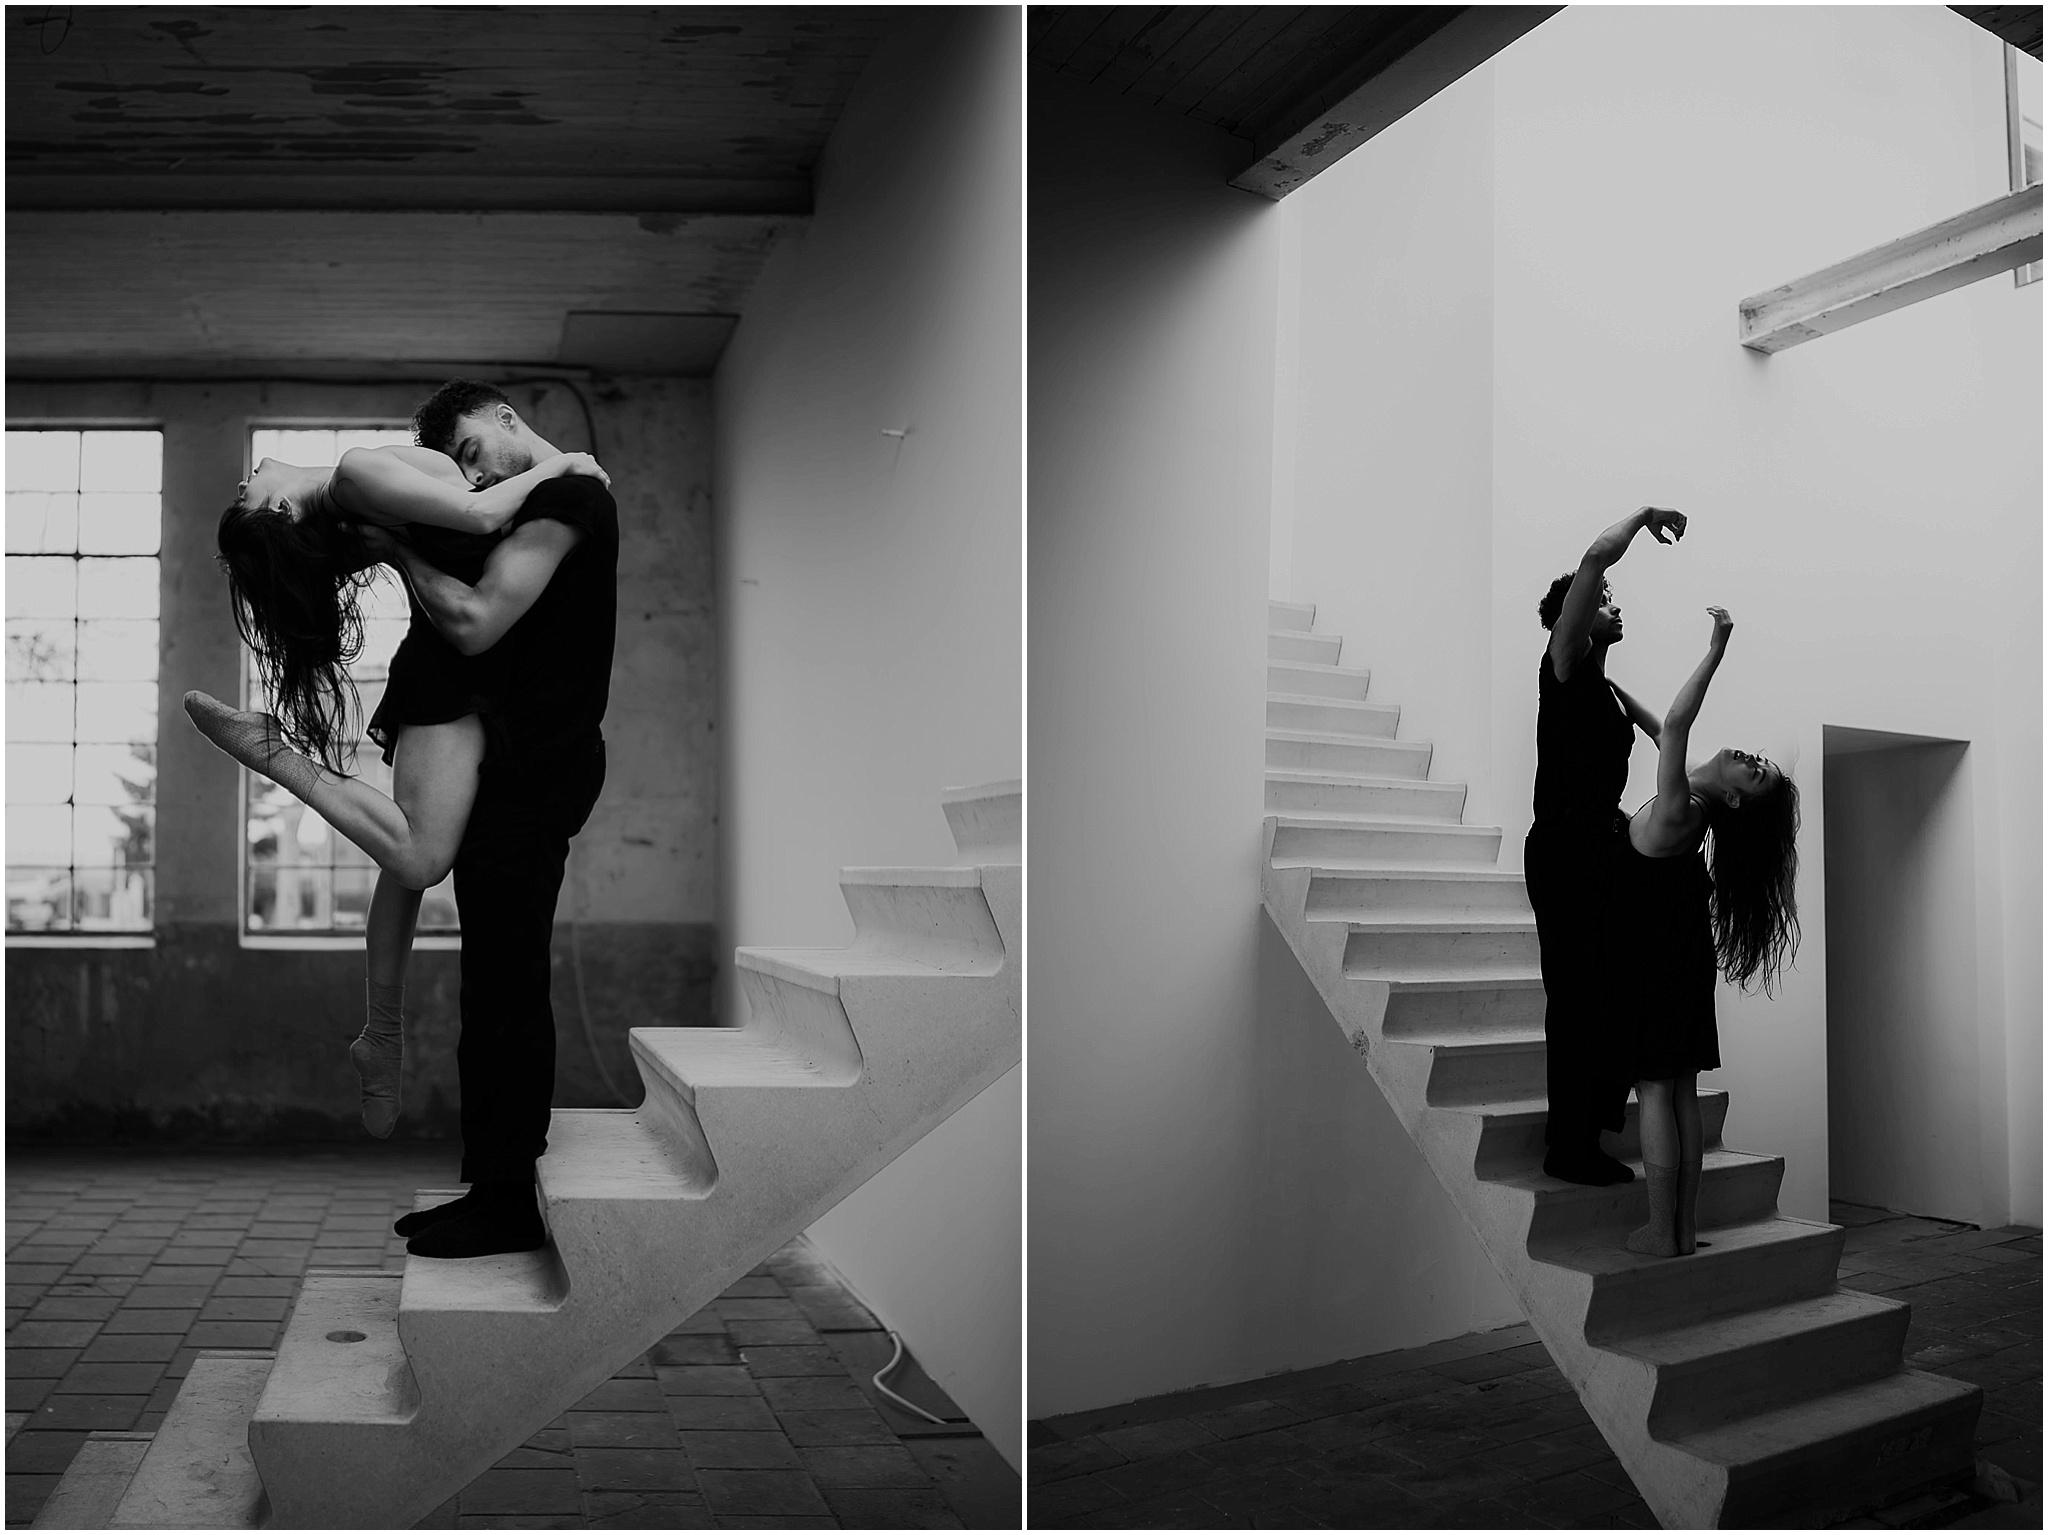 Artistic dance photography 00001.jpg